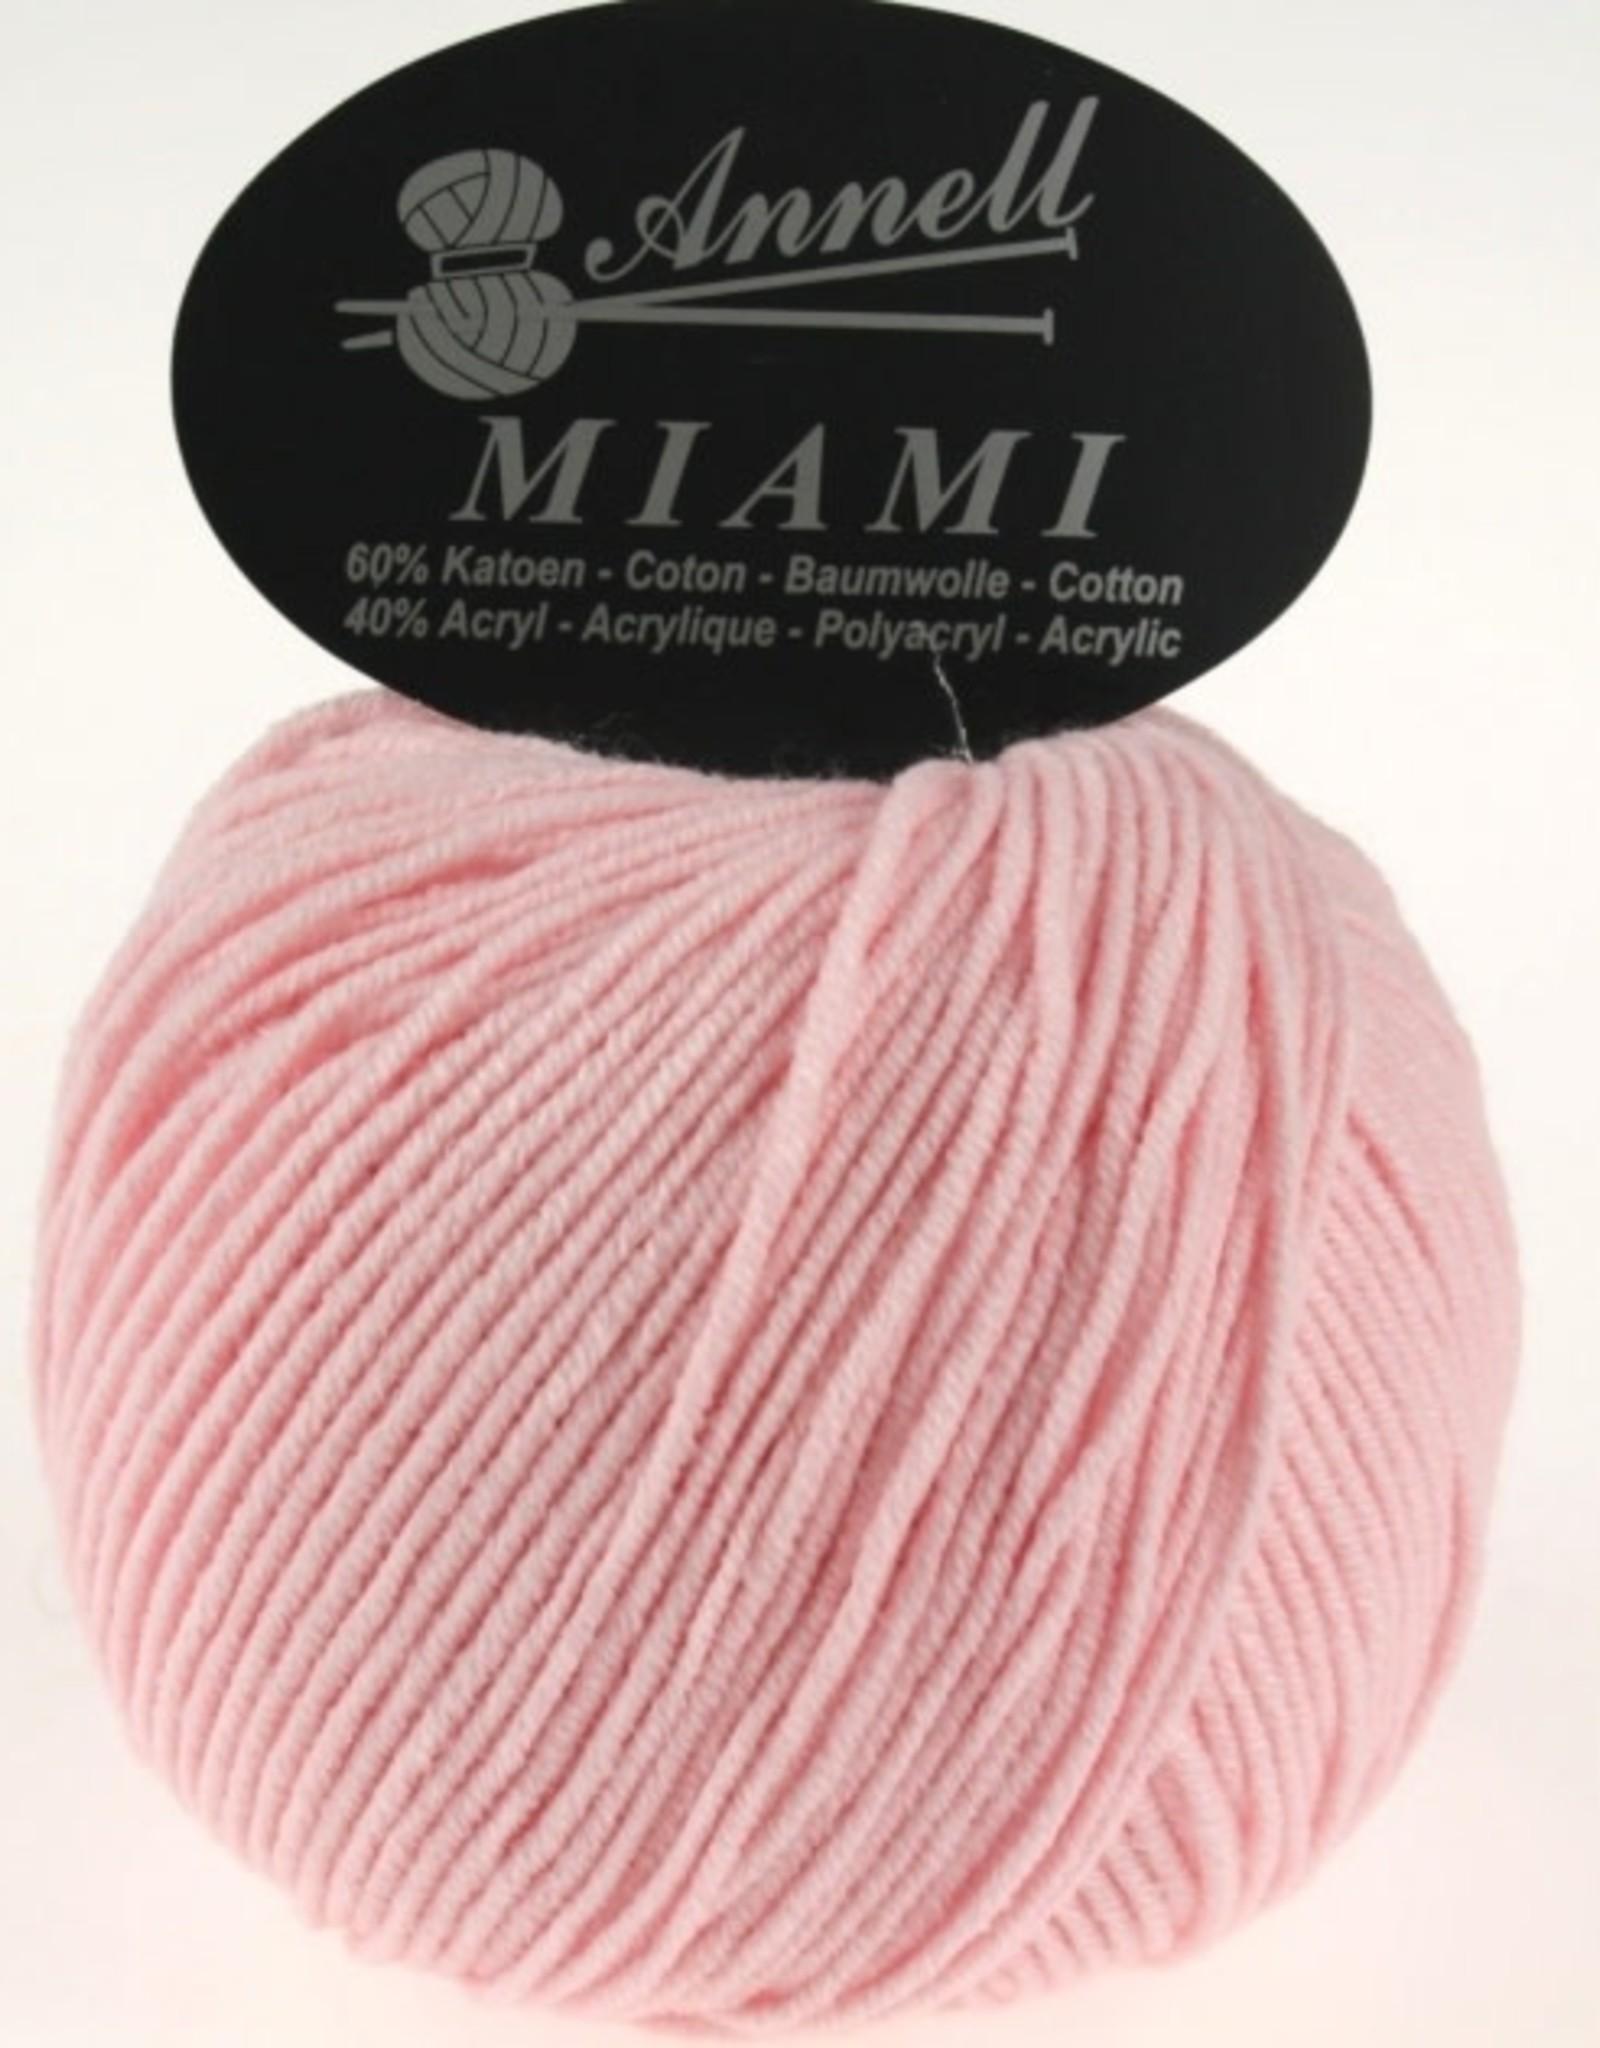 Annell Annell Miami 8932